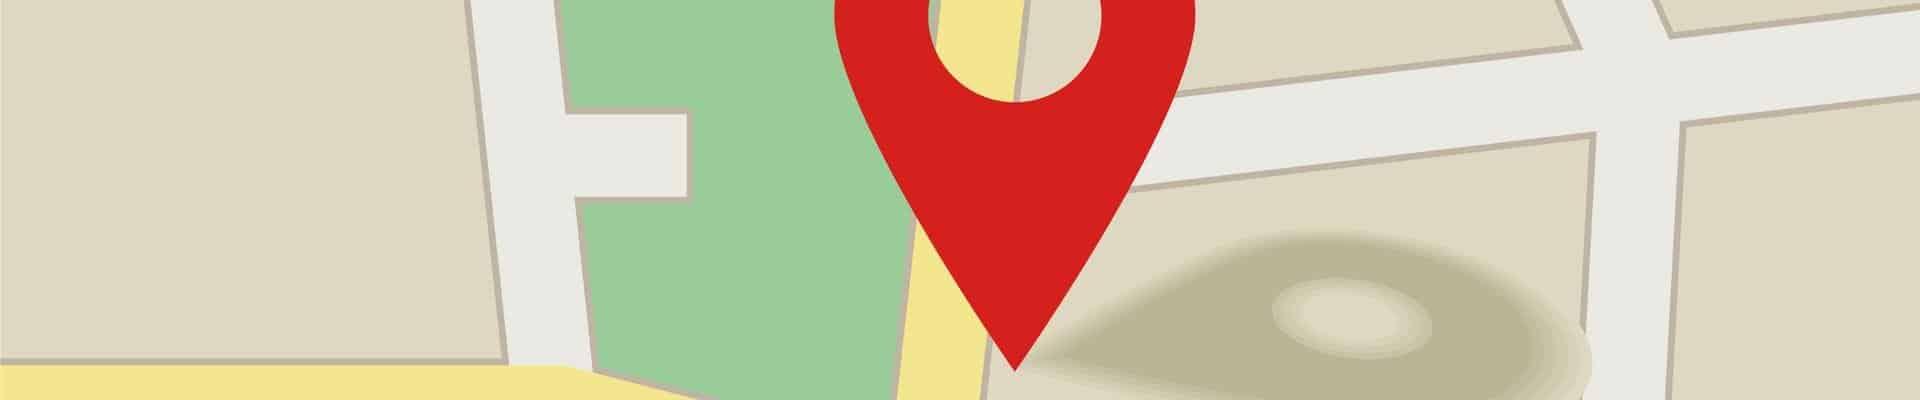 PriPost locaties in Nederland en Spanje